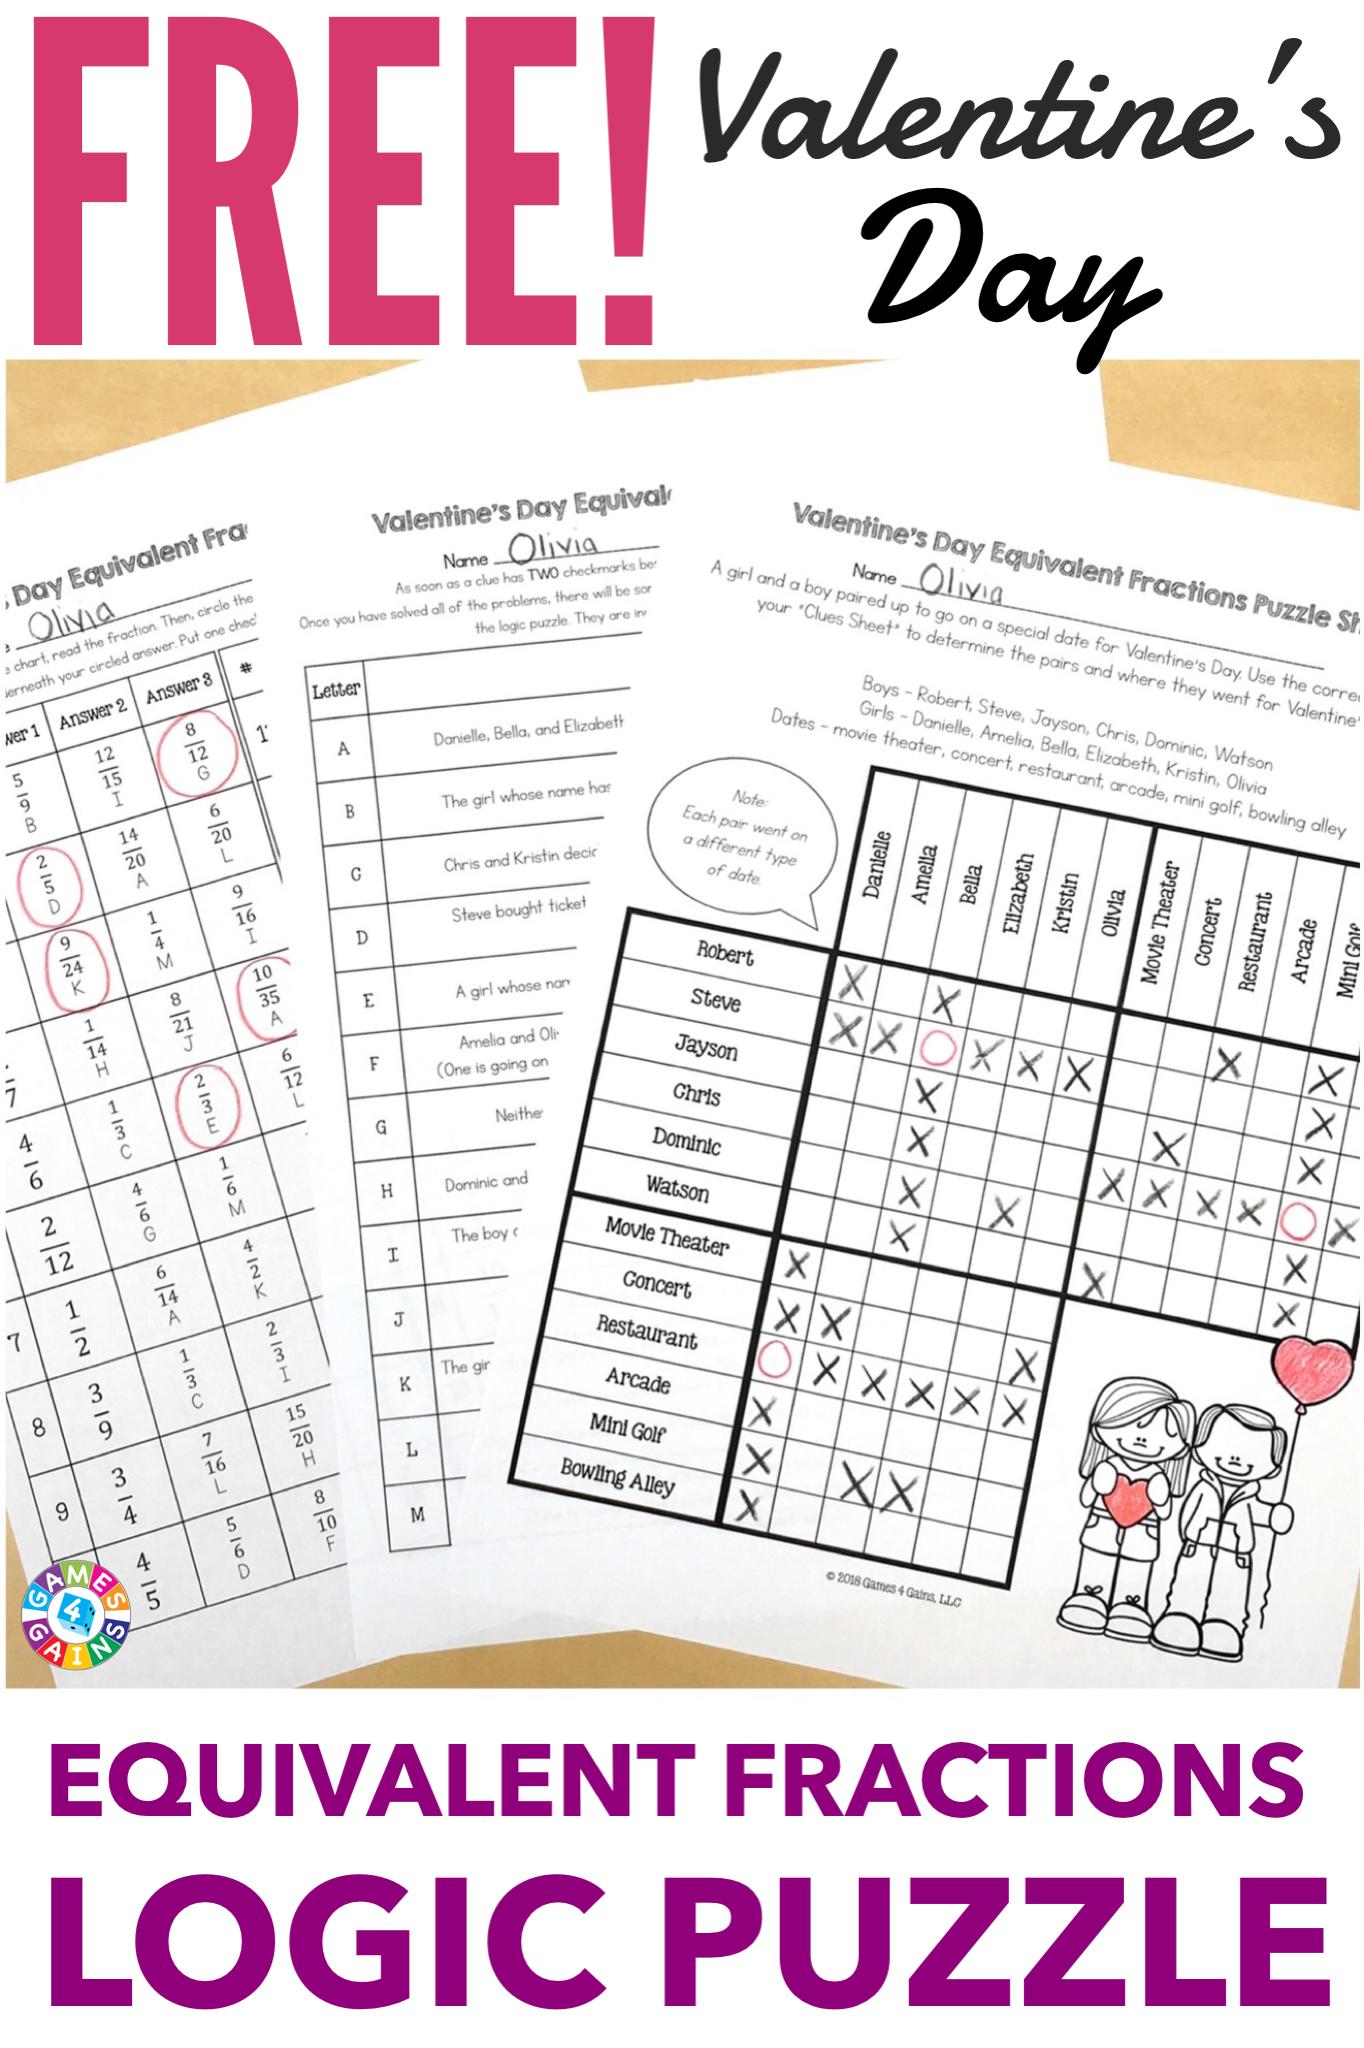 Free Valentine S Day Math Logic Puzzle Equivalent